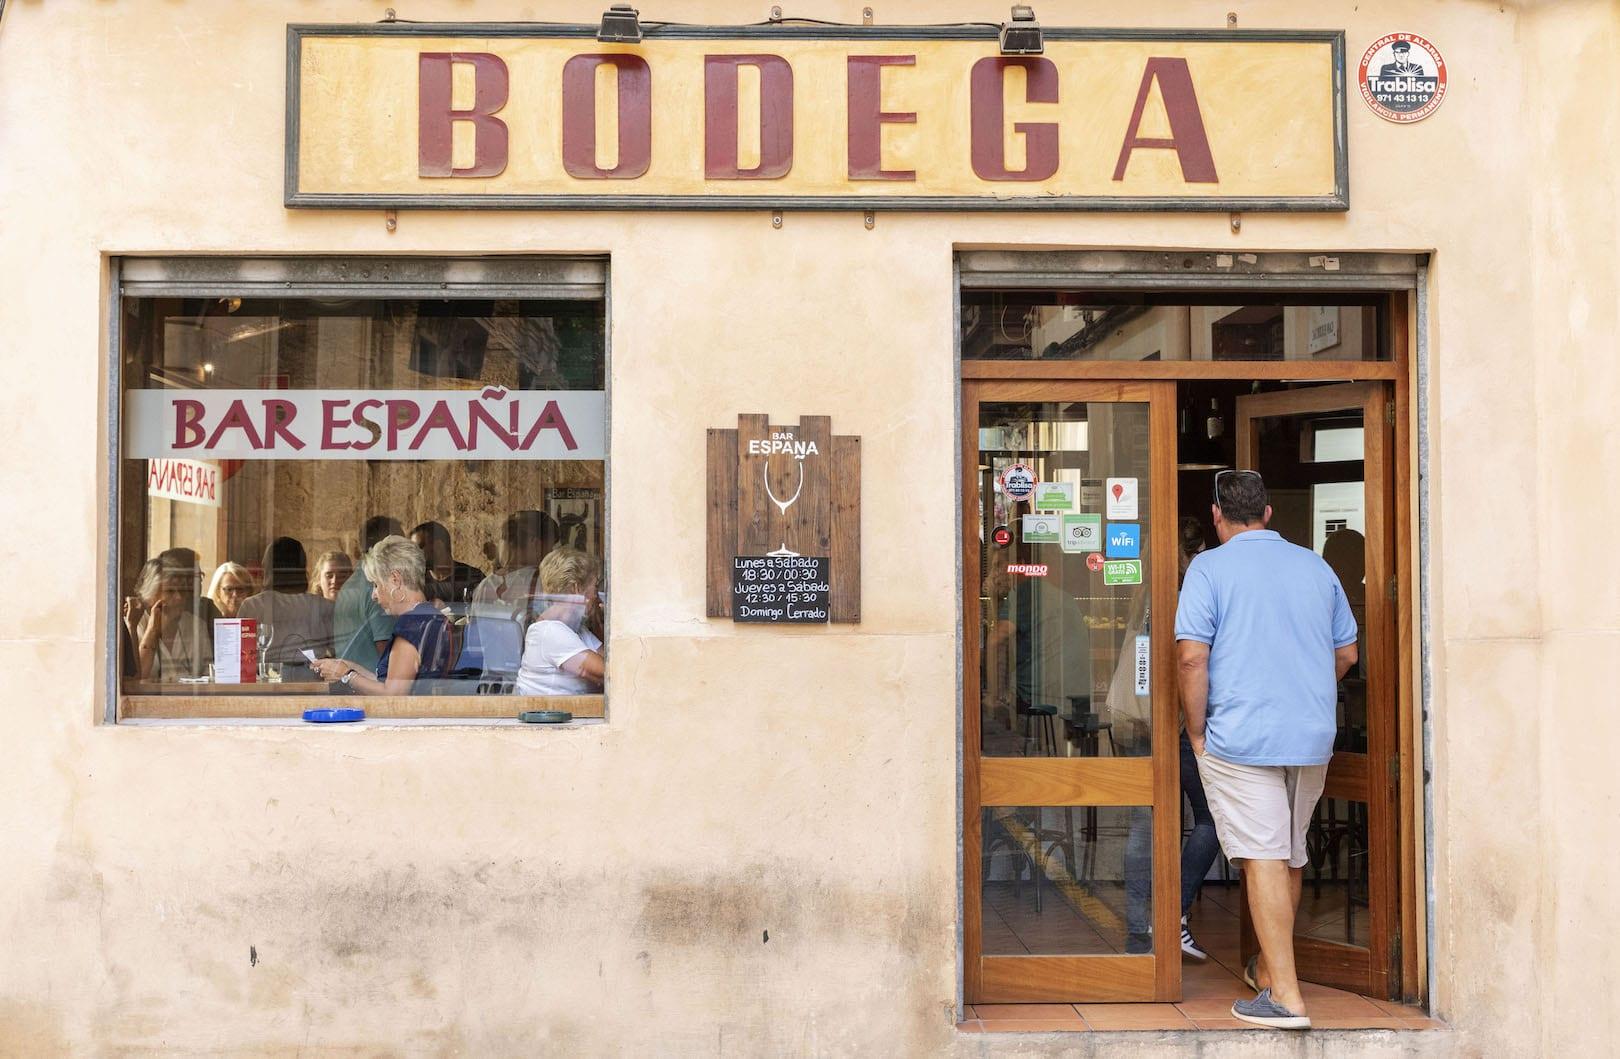 Bar España, C/ Can Escursac, 12 971 72 42 34 (Nähe Plaza Mayor) . Tapas und Weine, Wermuts